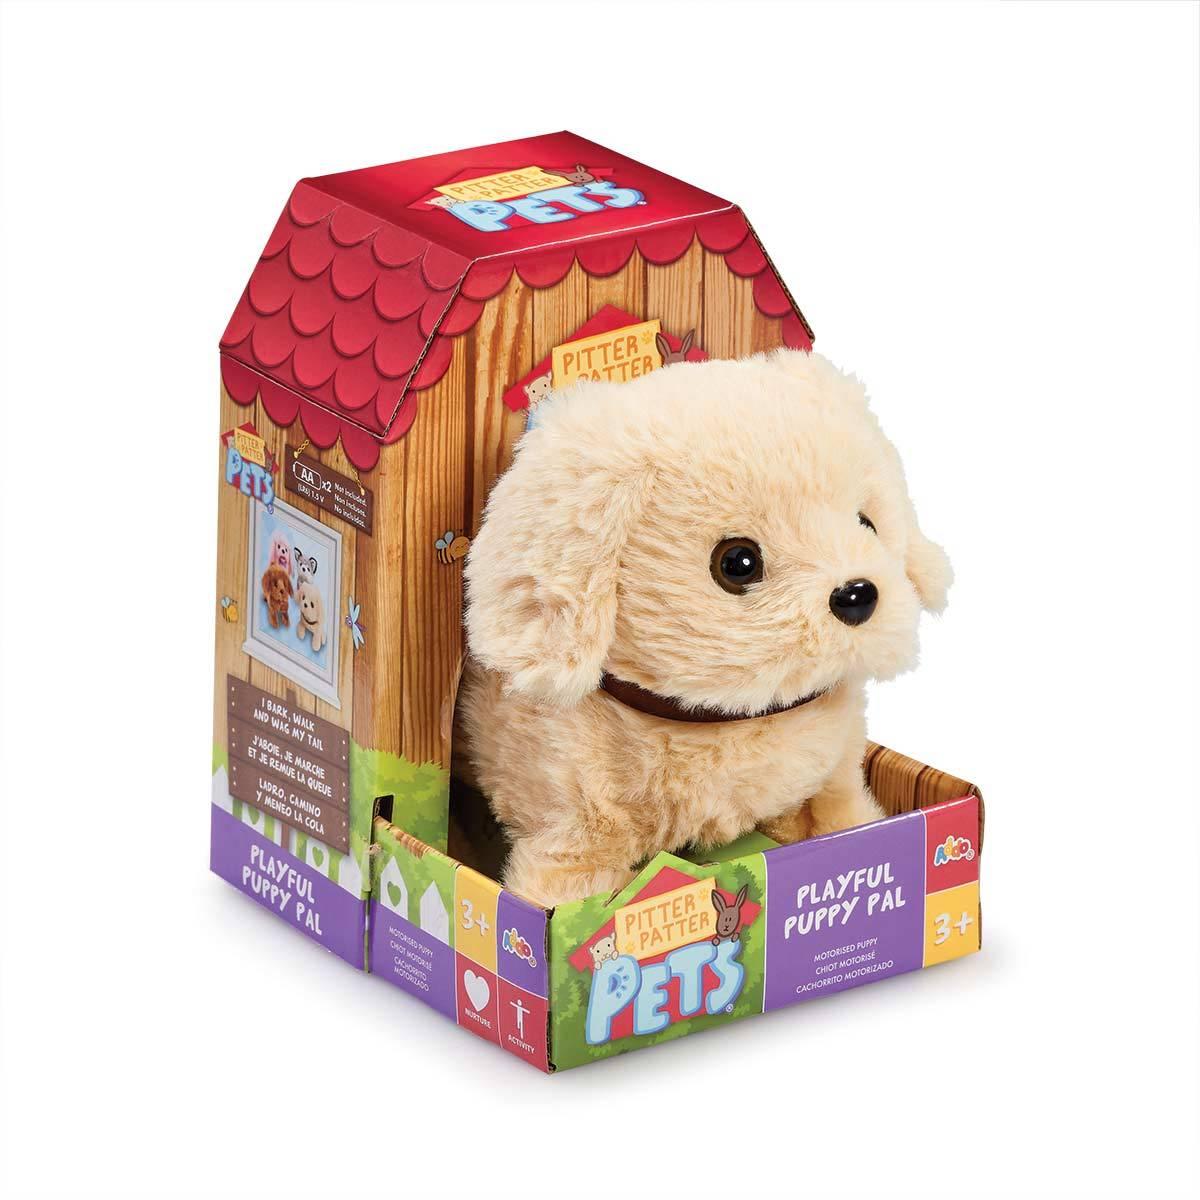 Pitter Patter Pet Playful Puppy Pal Soft Toy - Golden Lab